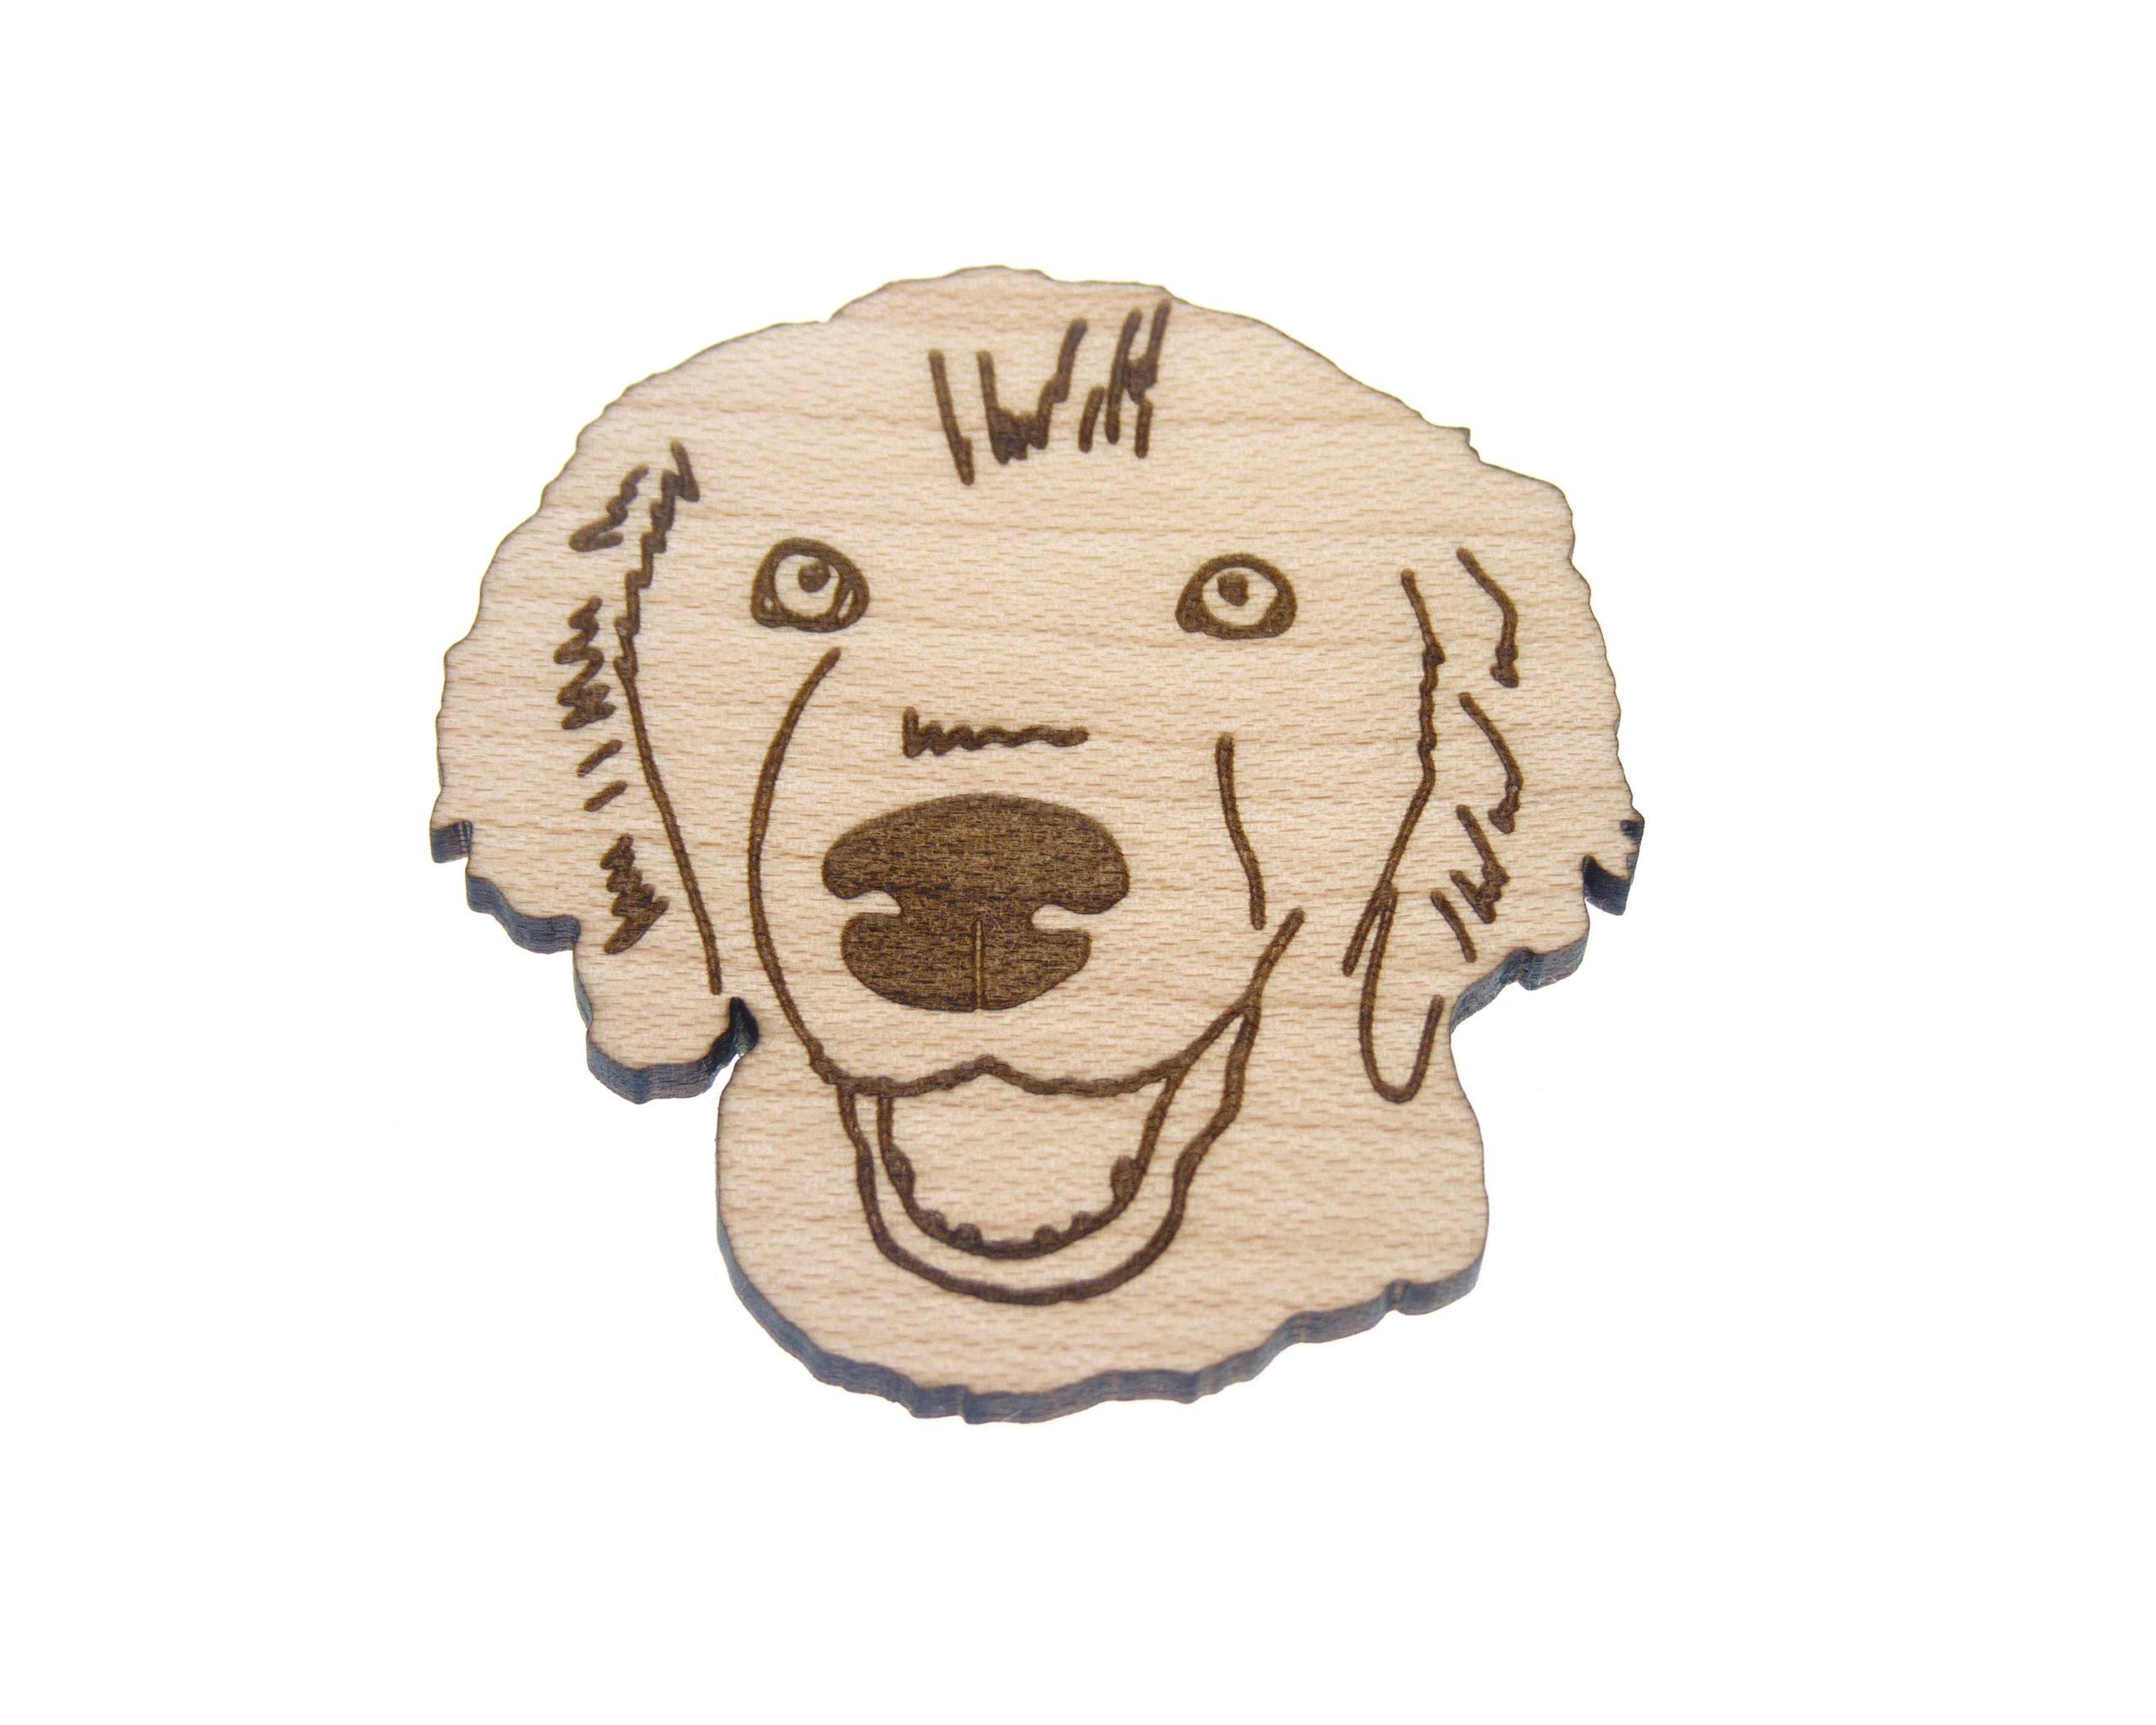 Golden Retriever Dog Maple Hardwood Pin | Hand Drawn